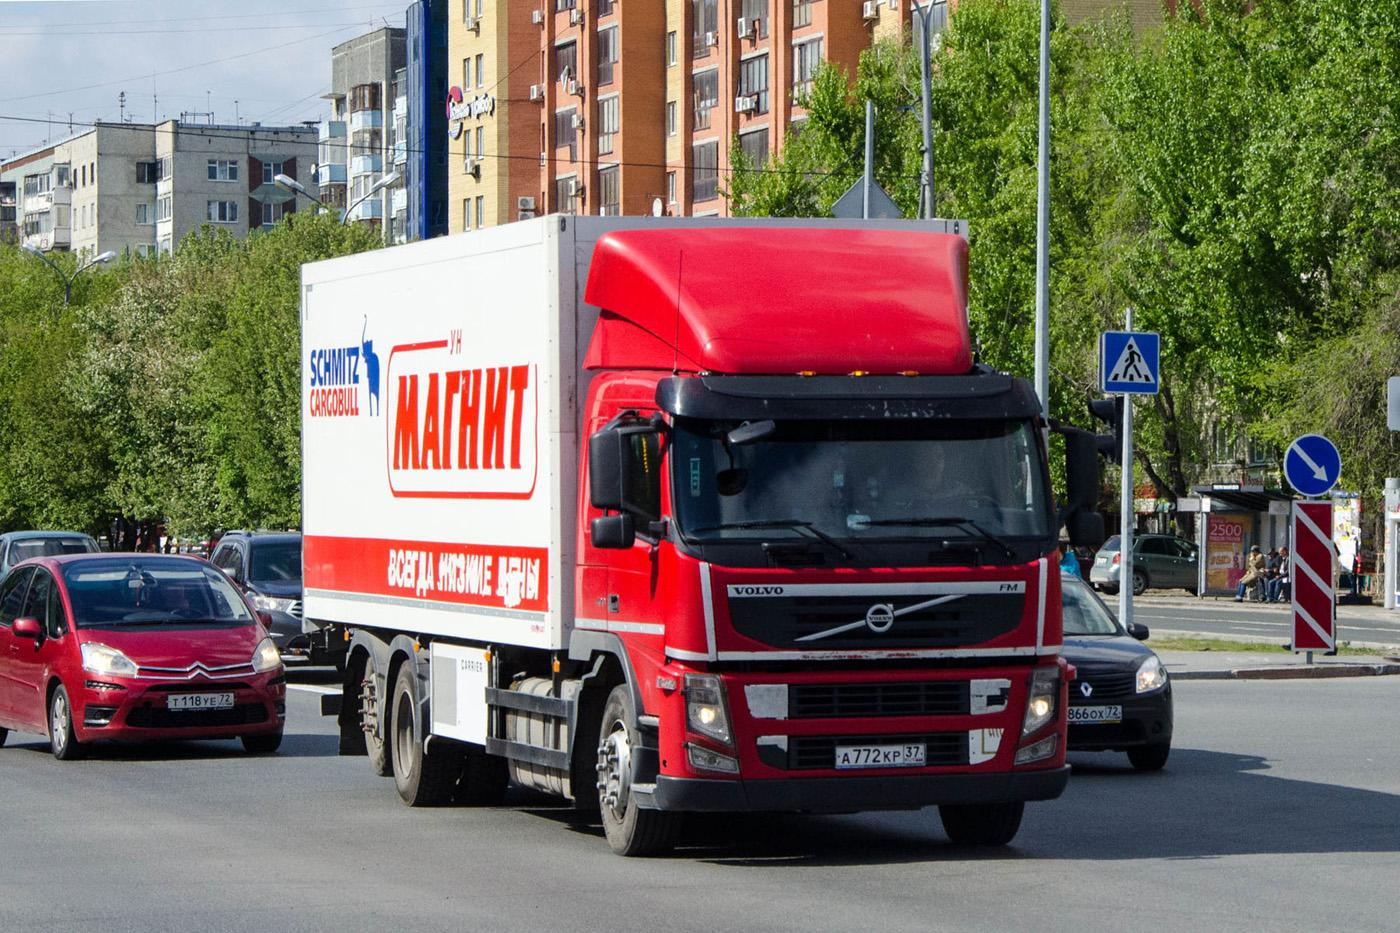 Фургон Schmitz Cargobull на шасси Volvo FM* #А 772 КР 37 . Тюмень, улица 50 лет Октября